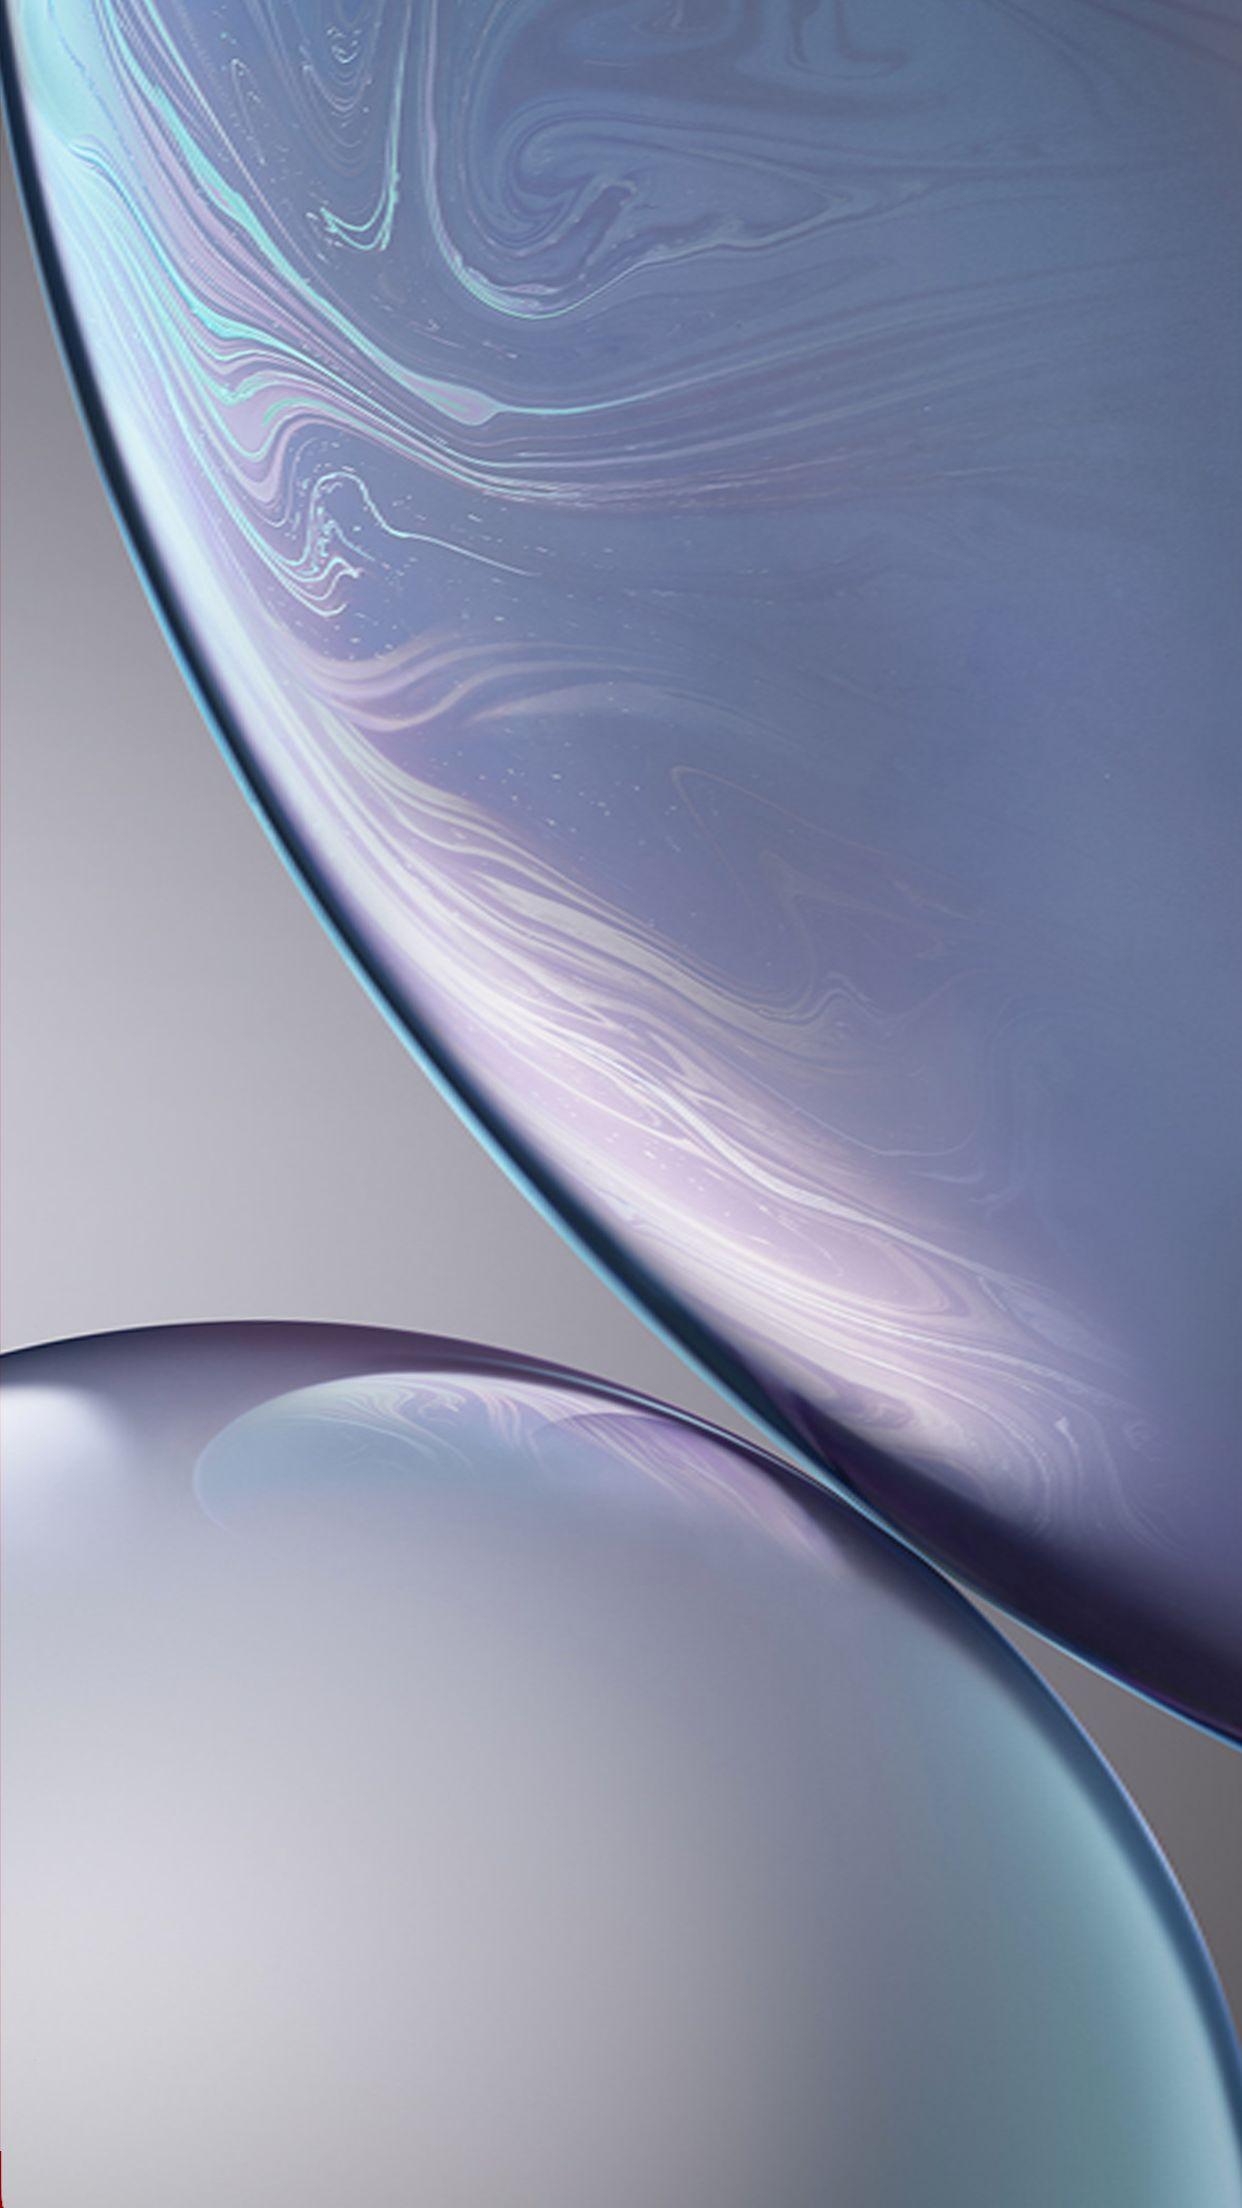 iPhone XR Stock Wallpaper 005 - 1242x2208